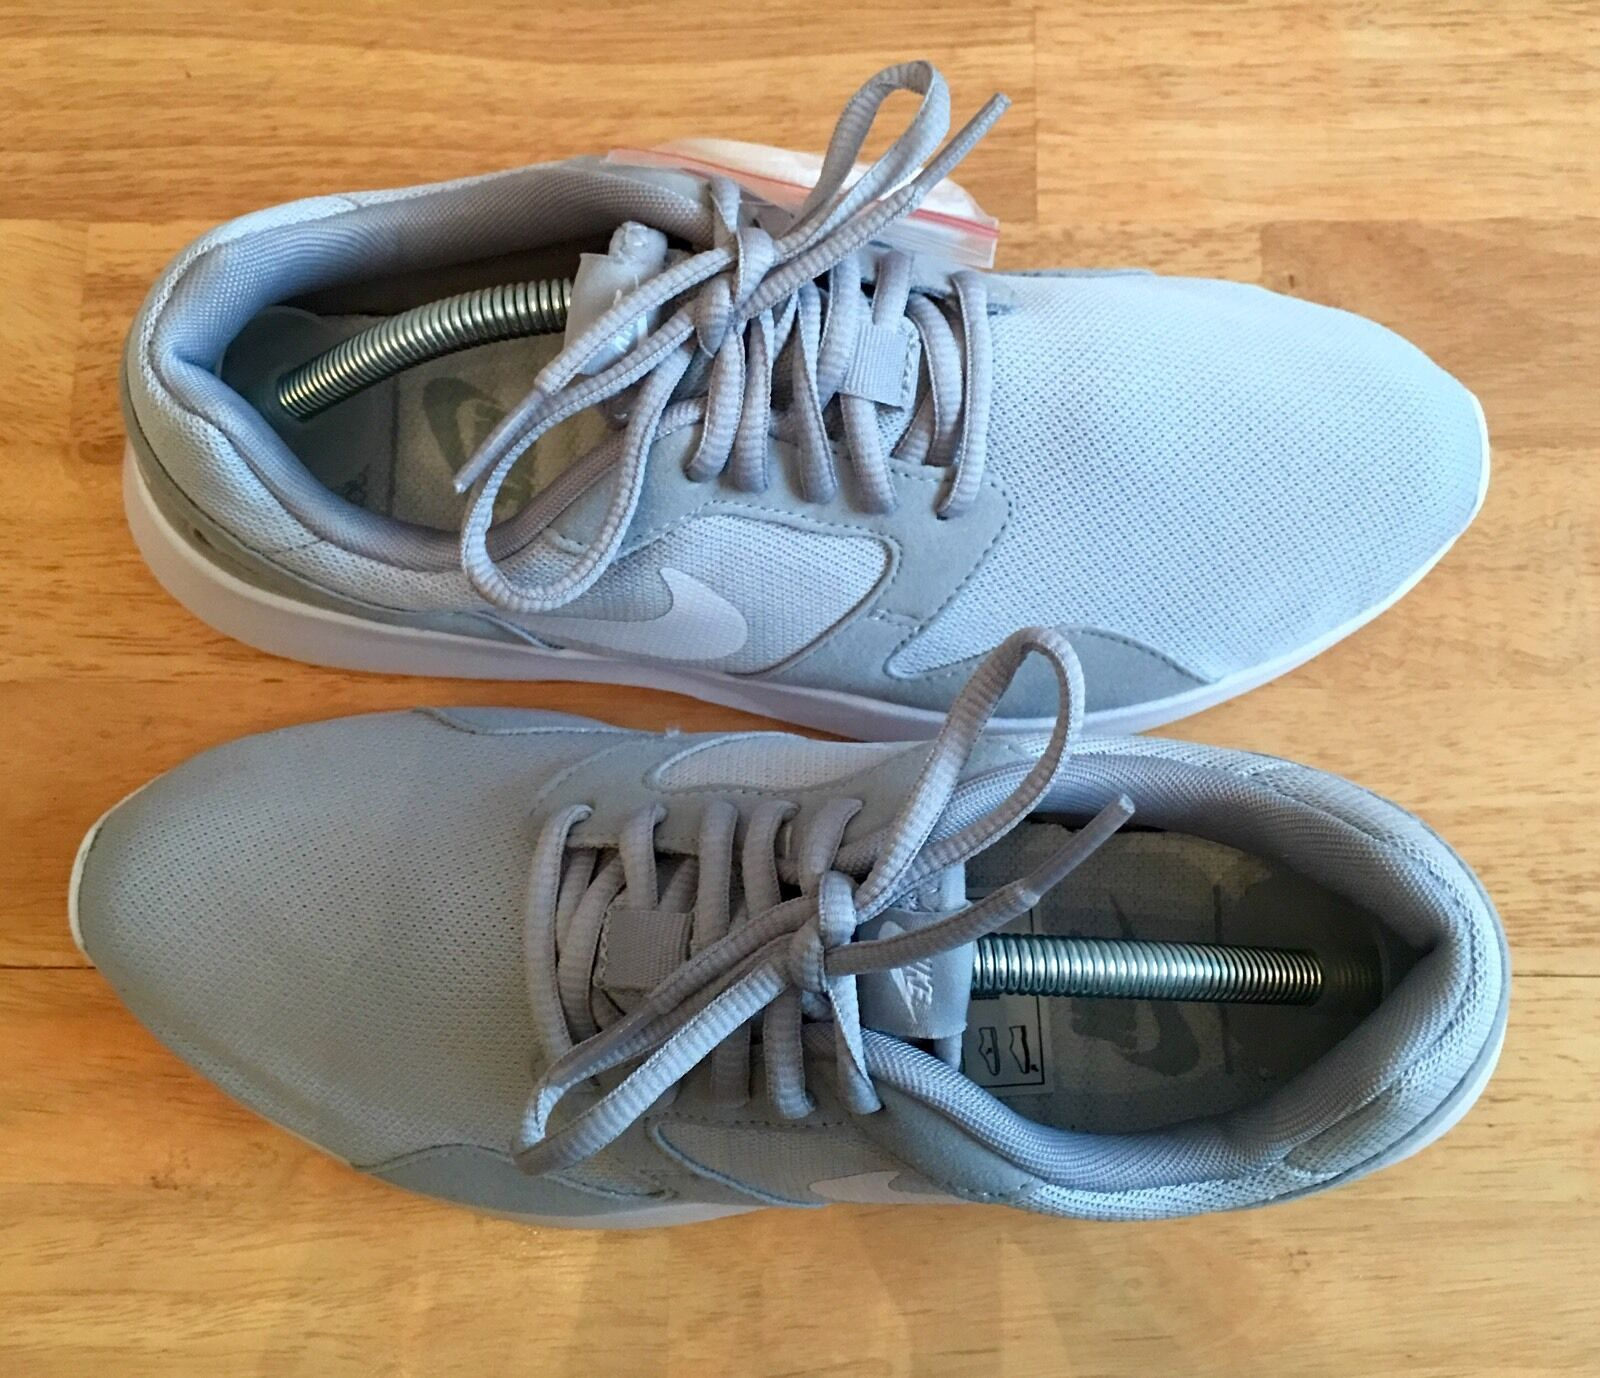 NIKE WMNS KAISHI WOLF gris gris / blanc  gris WOLF 90e9a3